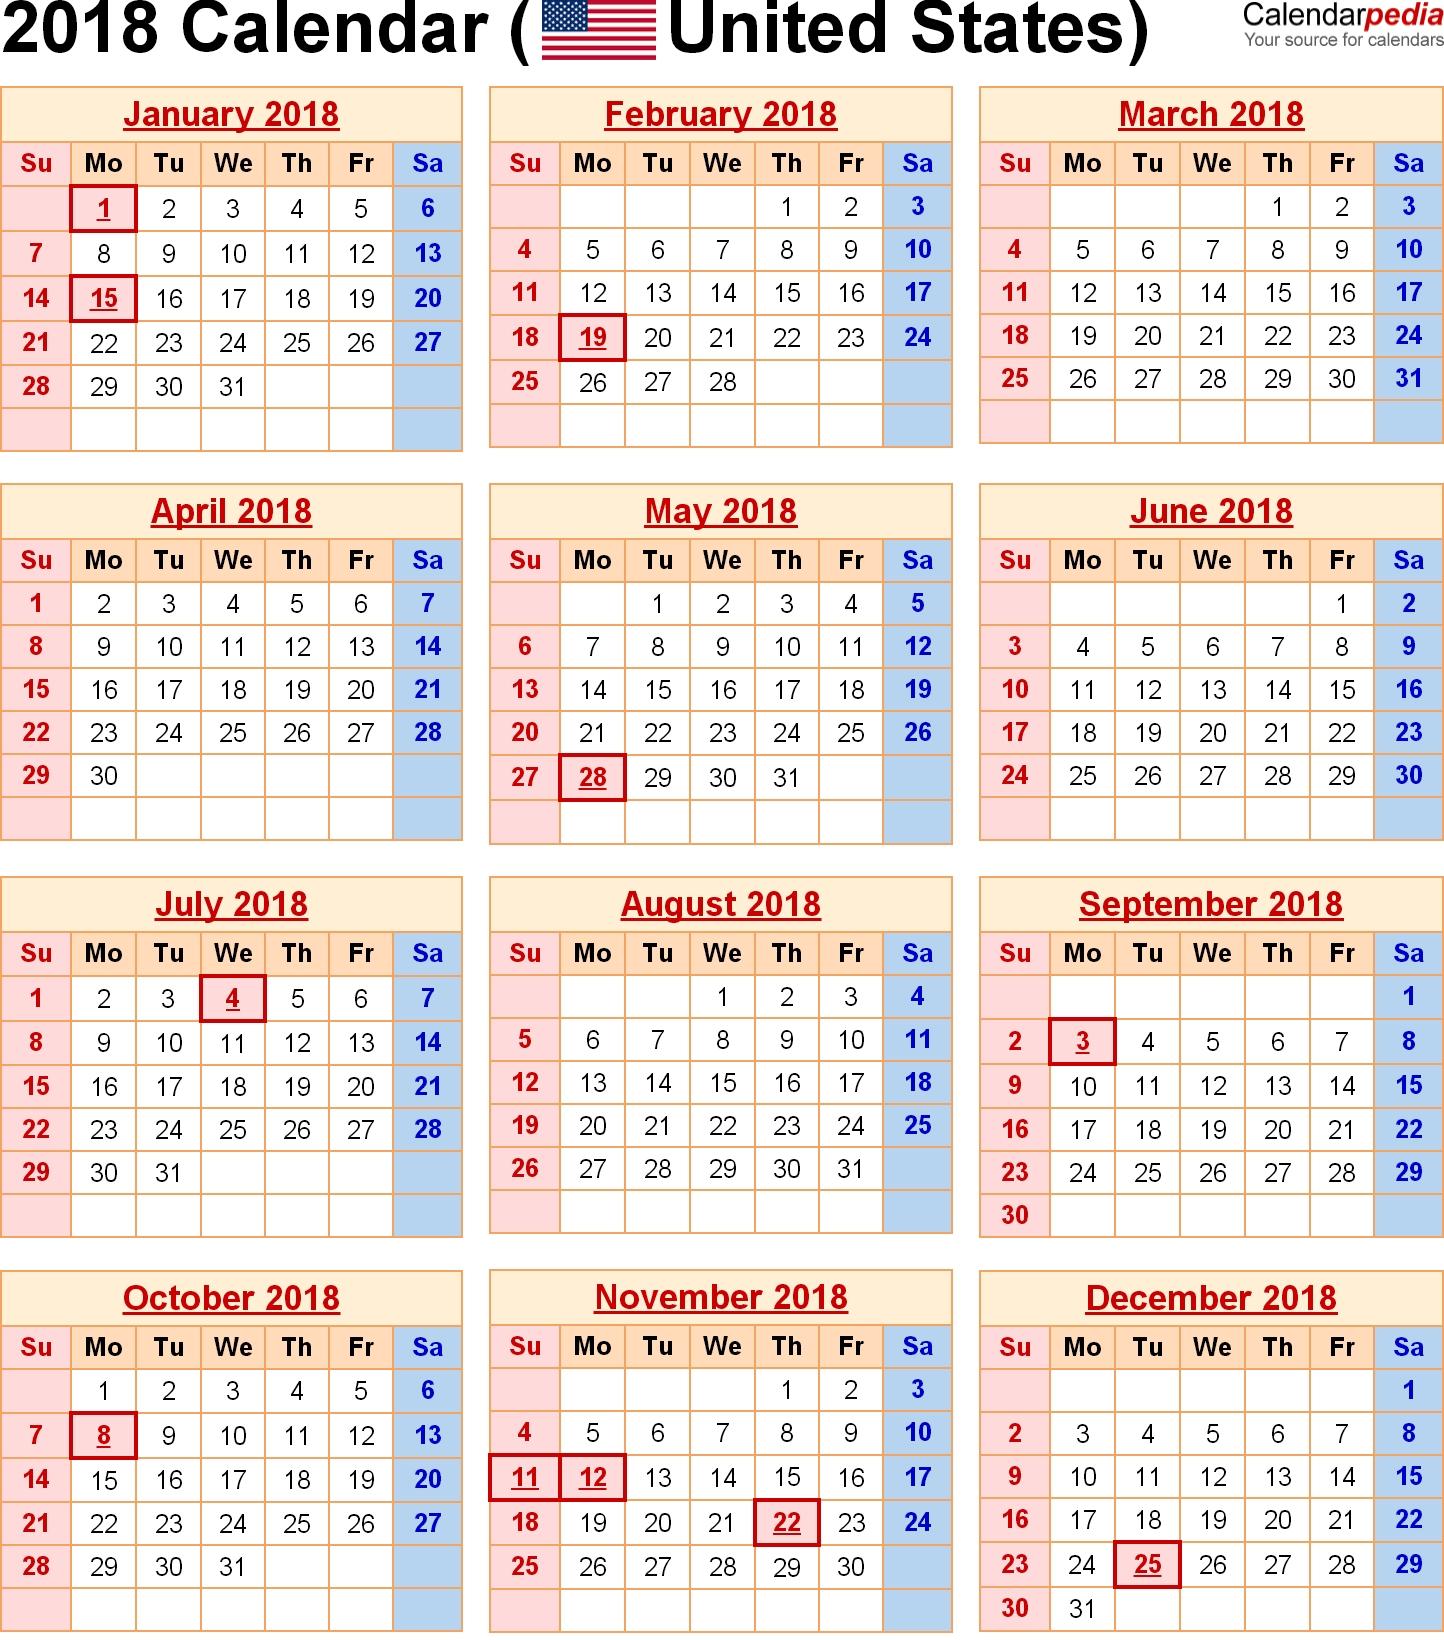 2018 Calendar United States Holidays | Holiday Calendar Printable-Blank I 9 Form 2021